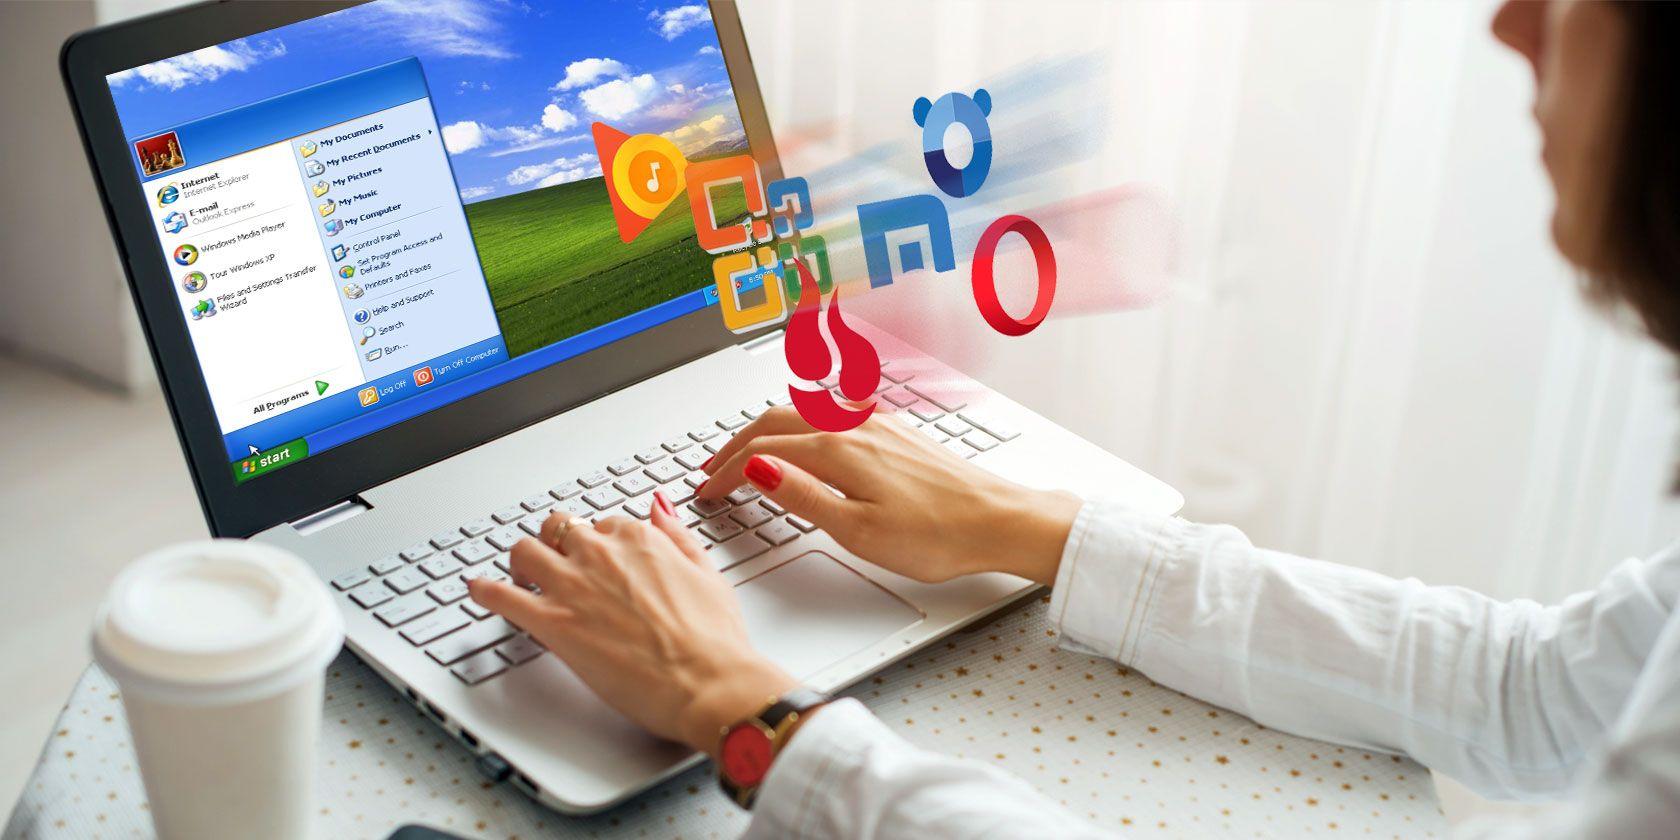 The Best Windows XP Software That Still Works